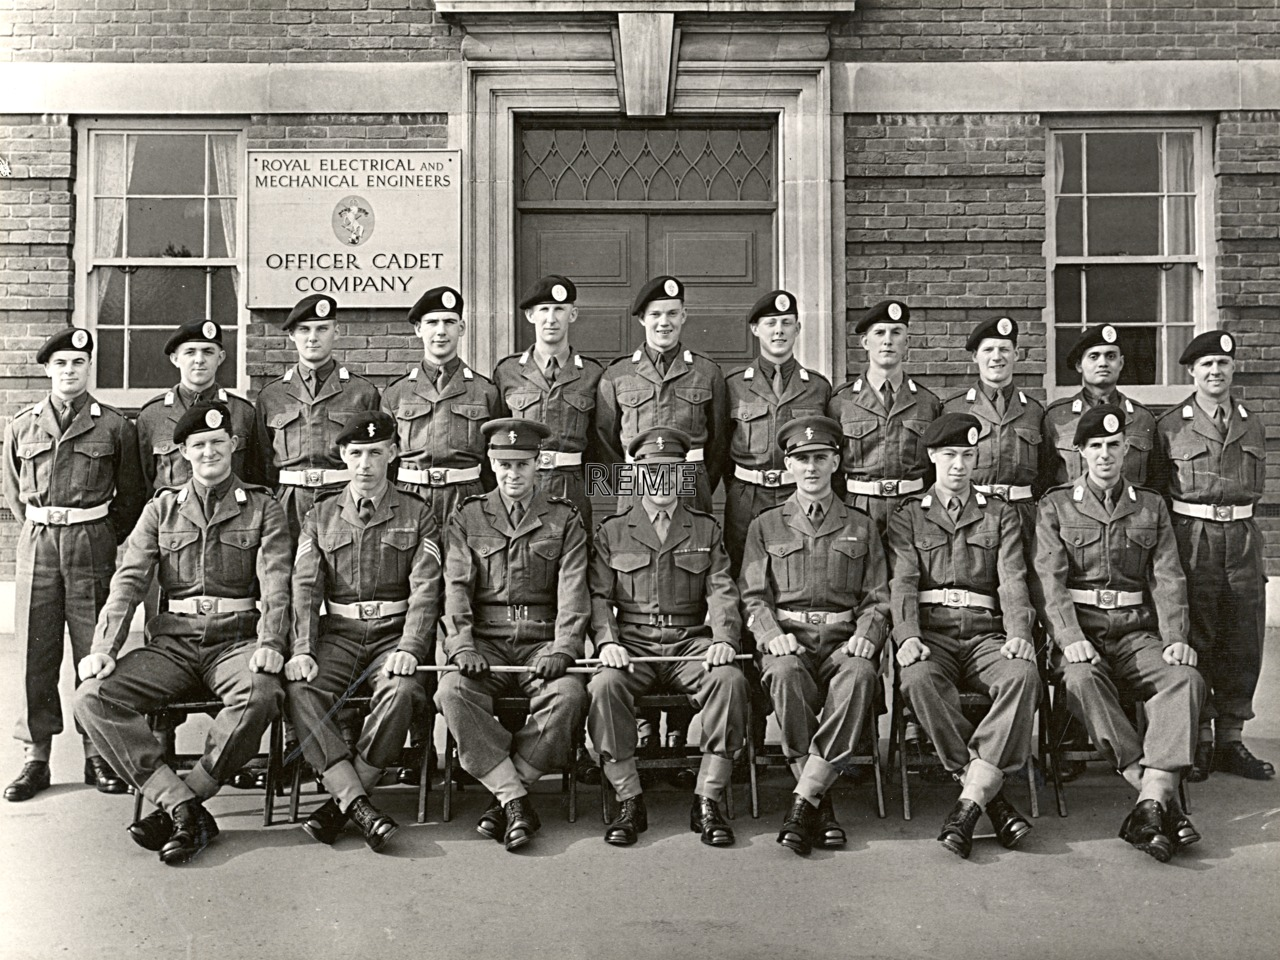 No 46, Cadet Officer General Course, Bordon: March 1957